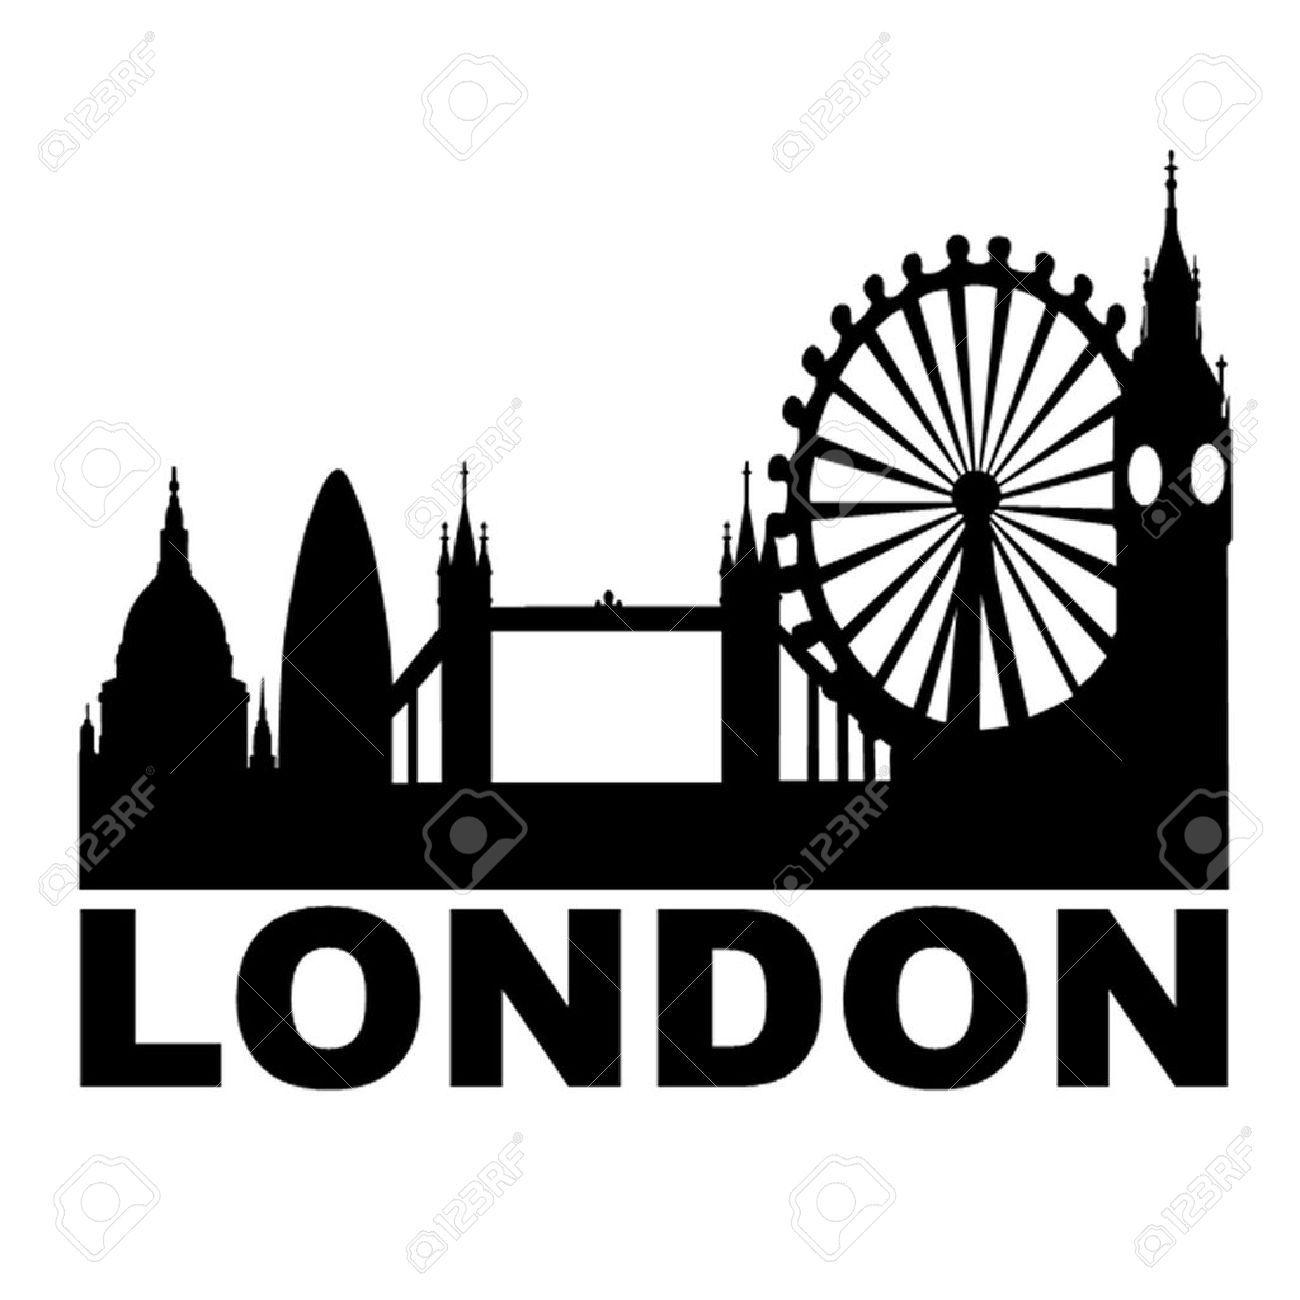 London Skyline London London Skyline London Skyline